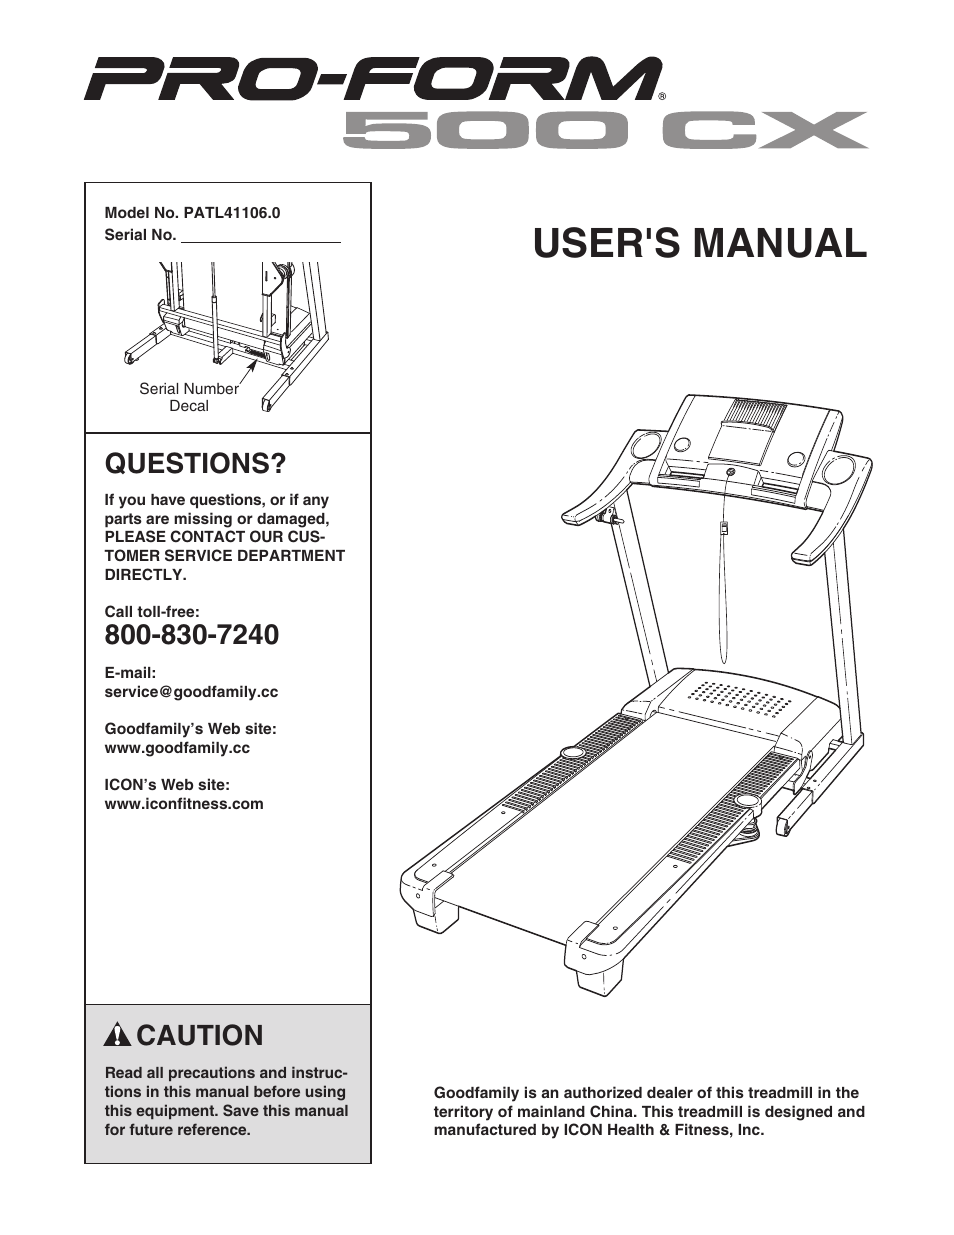 Inter Tel Pro Form 500 Cx Patl411060 User Manual 36 Pages Proform Treadmill Wiring Diagram